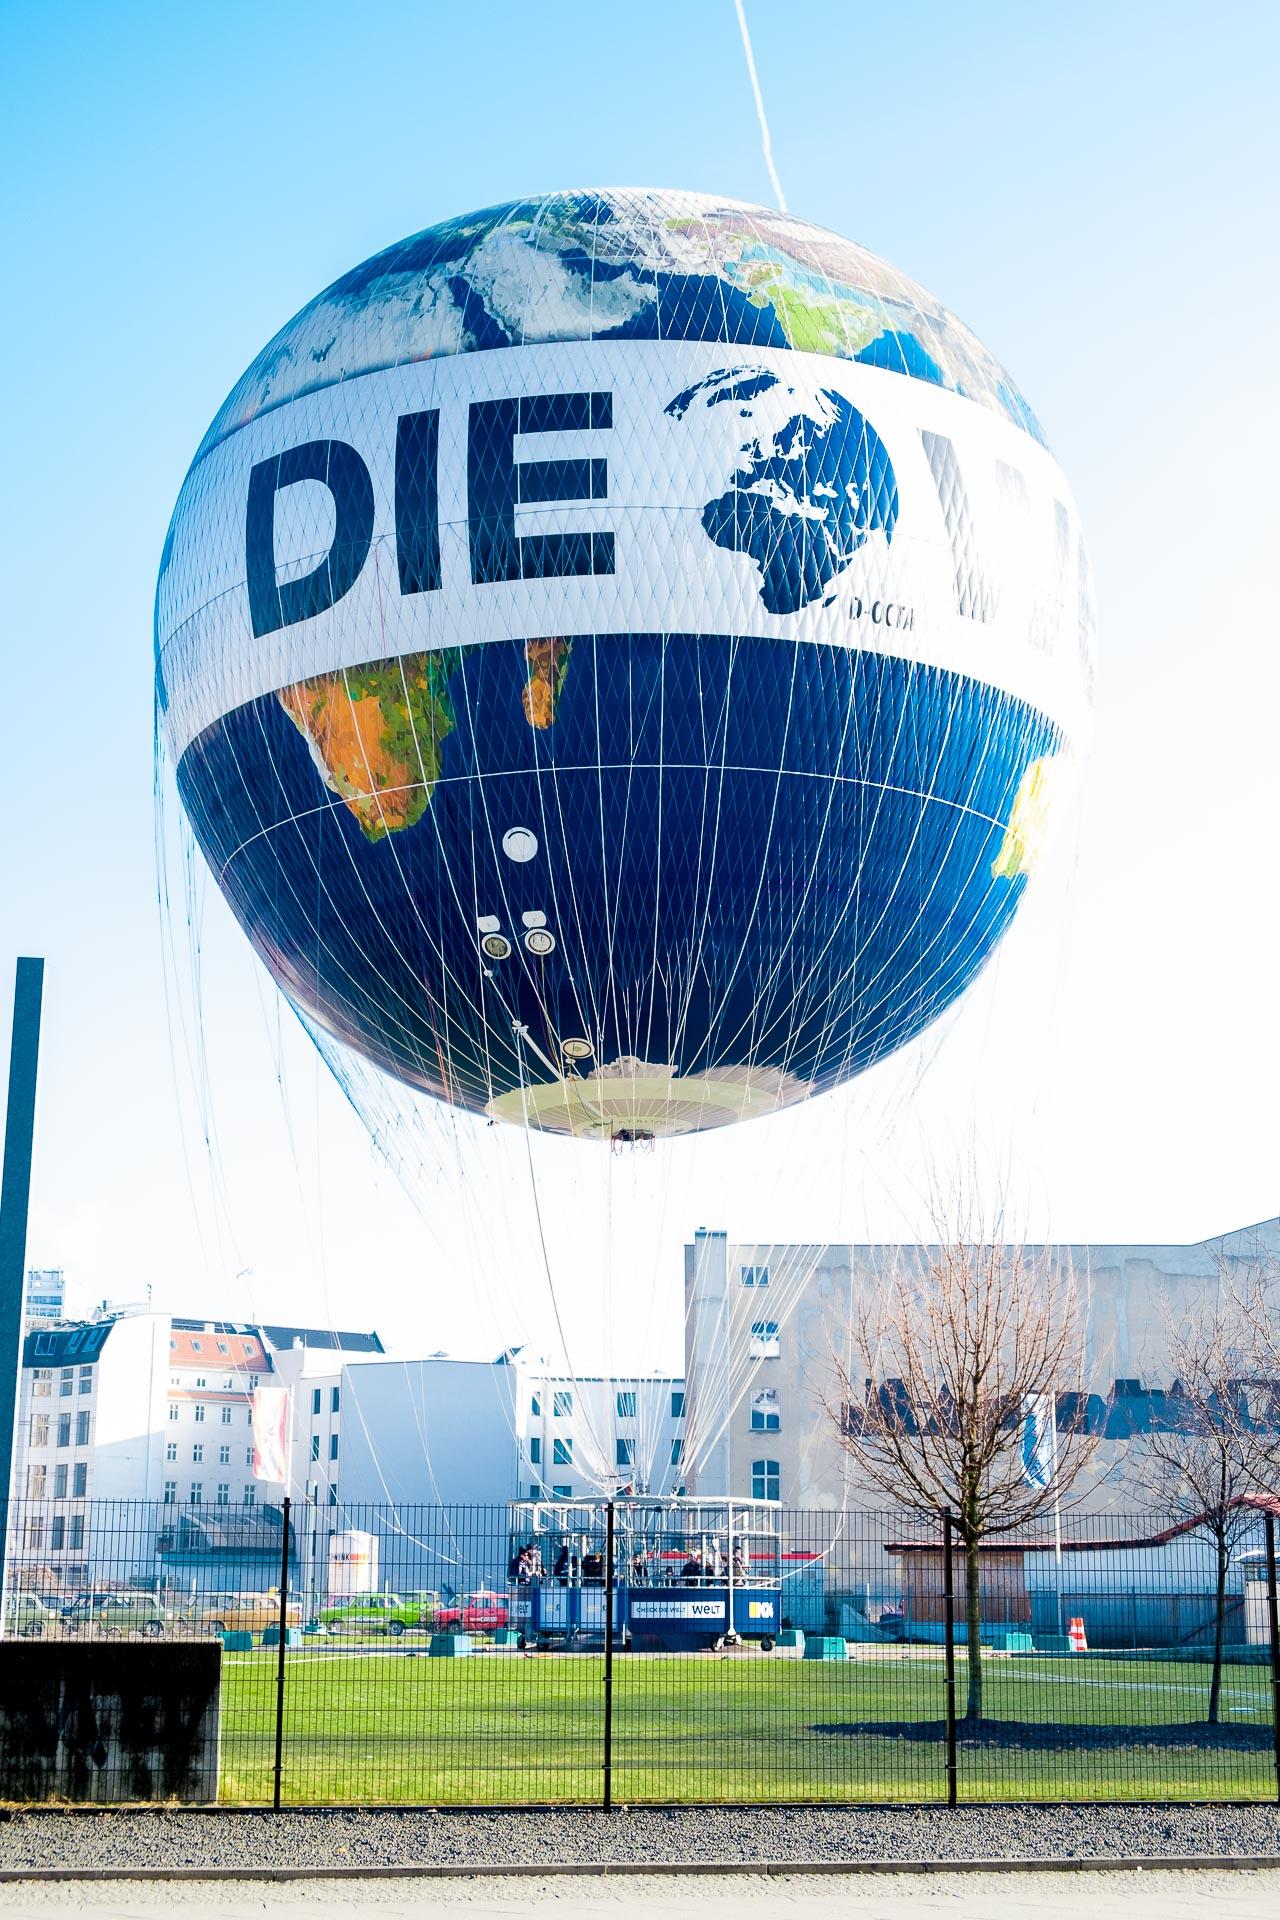 Mit dem Ballon hinauf - Air Service Berlin